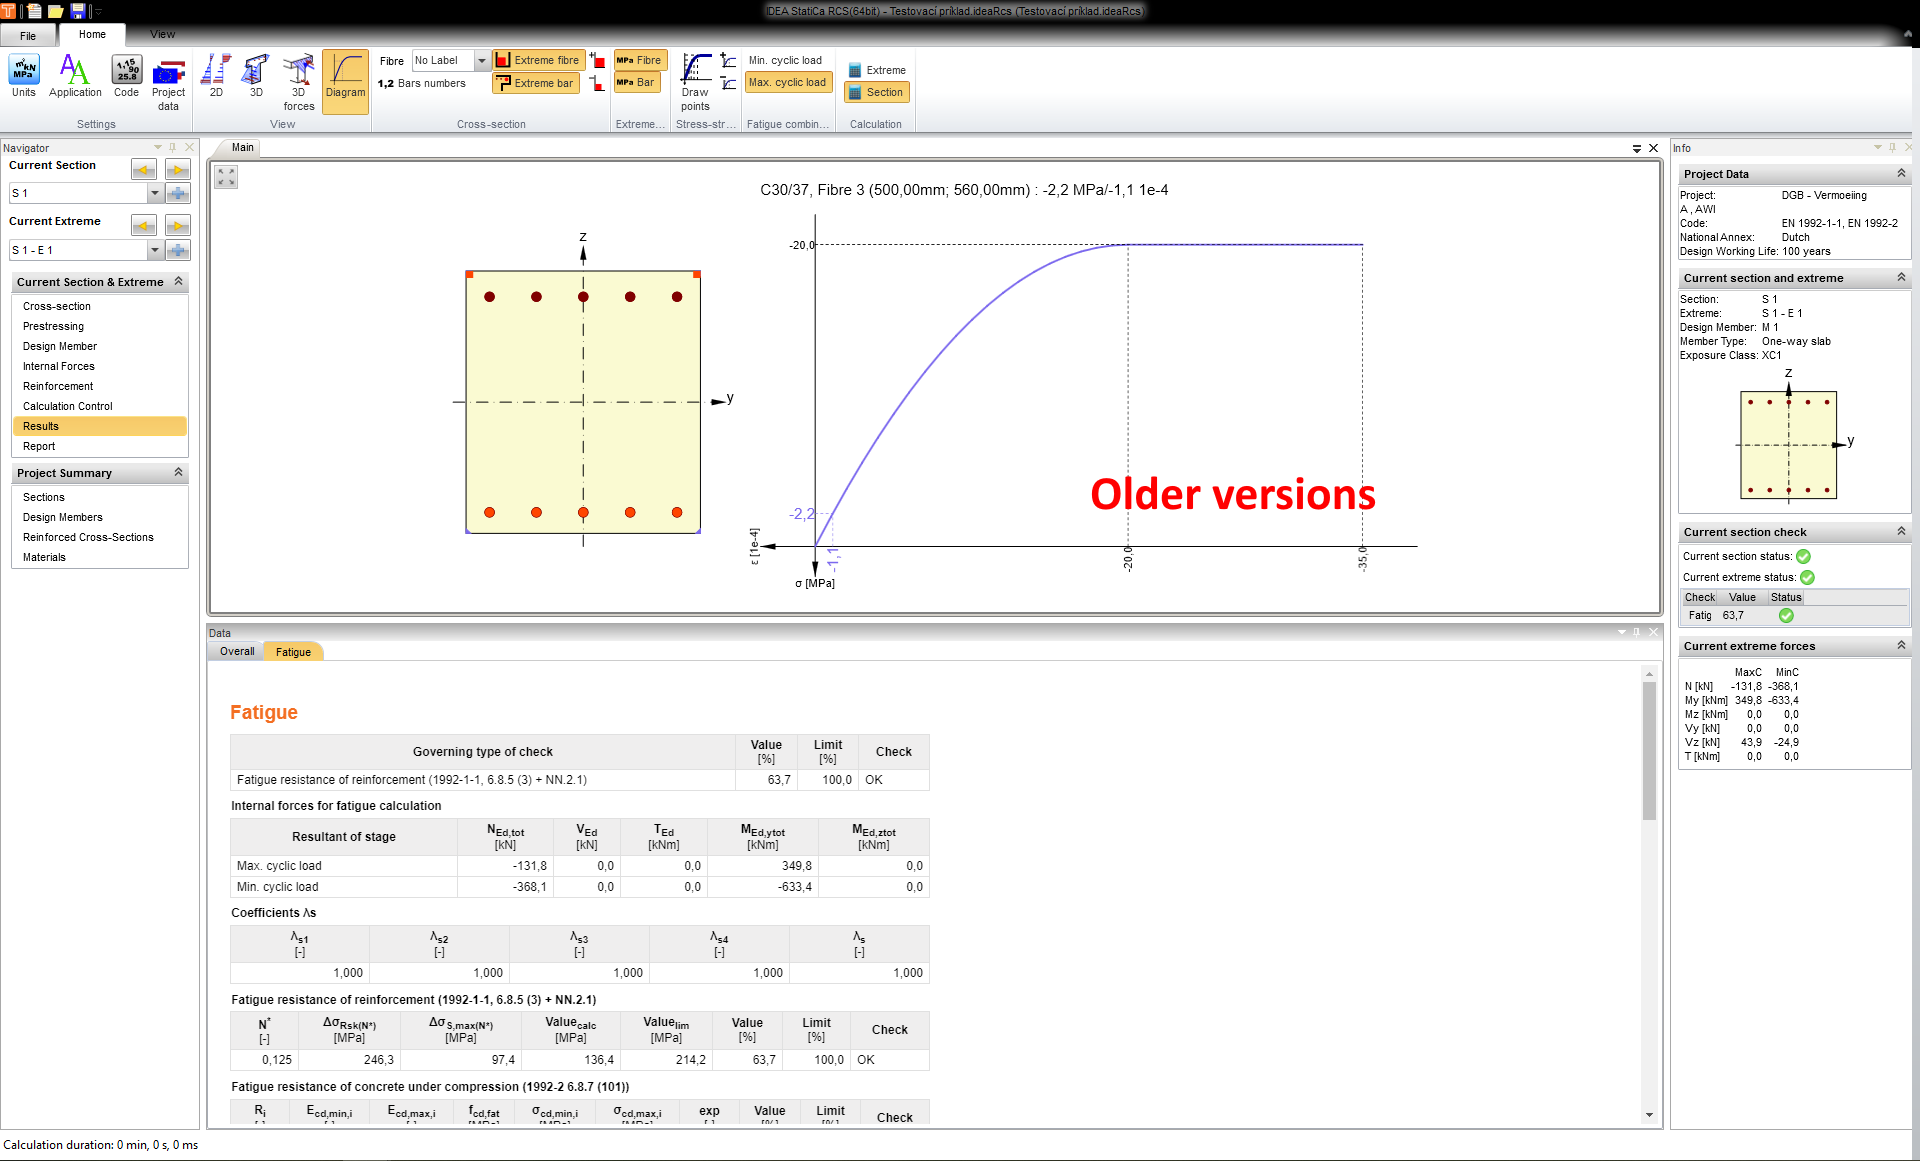 Vermoeidheidscontrole in IDEA RCS oudere versies